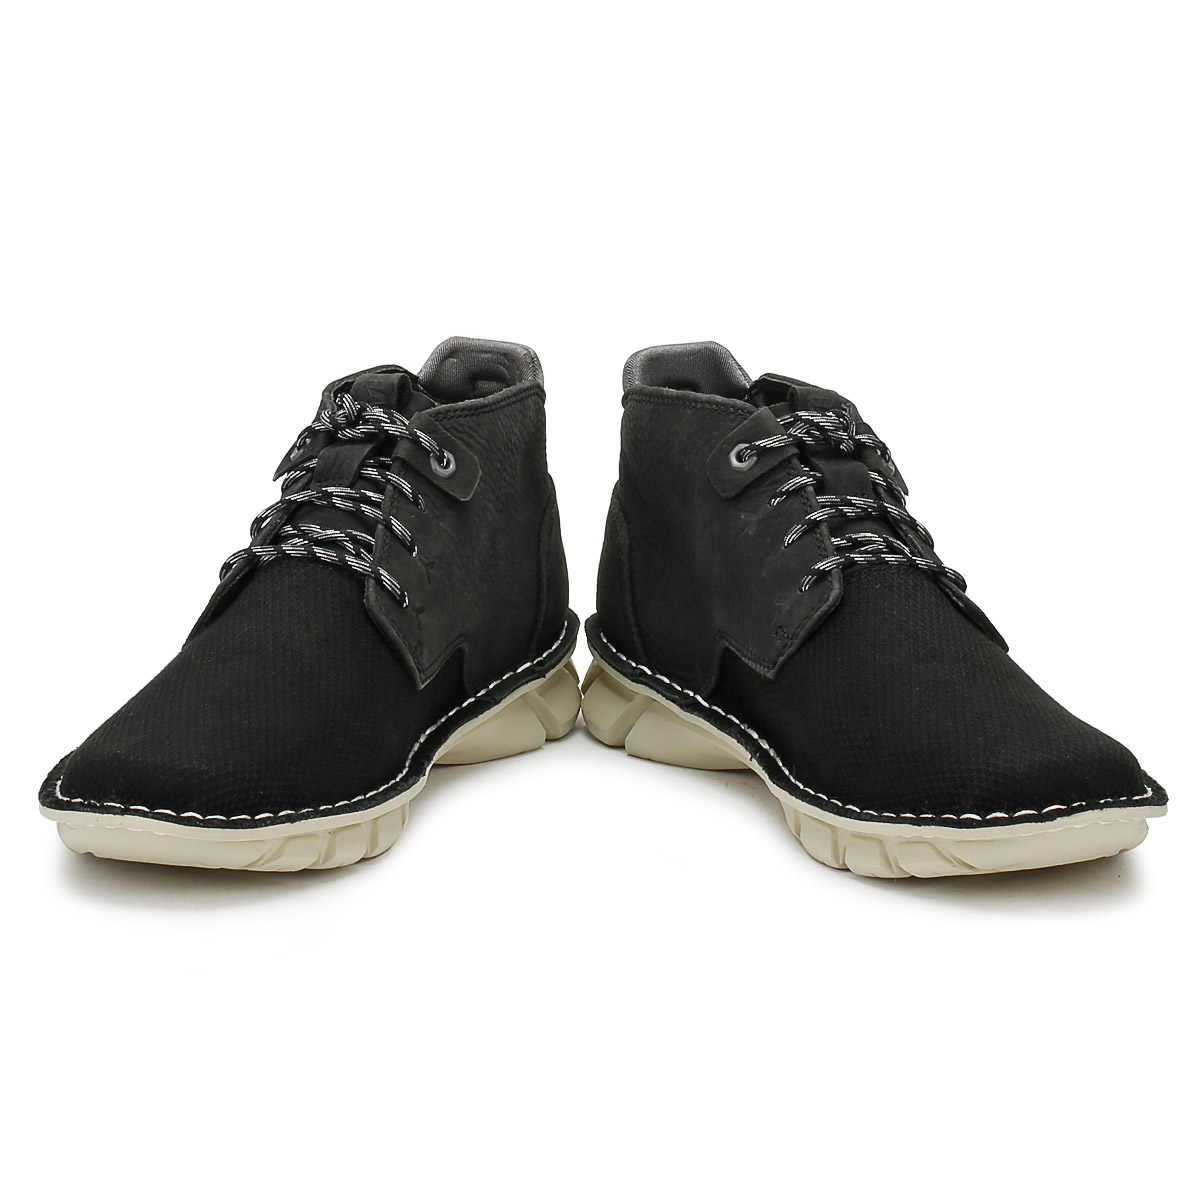 Caterpillar Mens Canvas Boots Black Almanac Lace Up Ankle Shoes